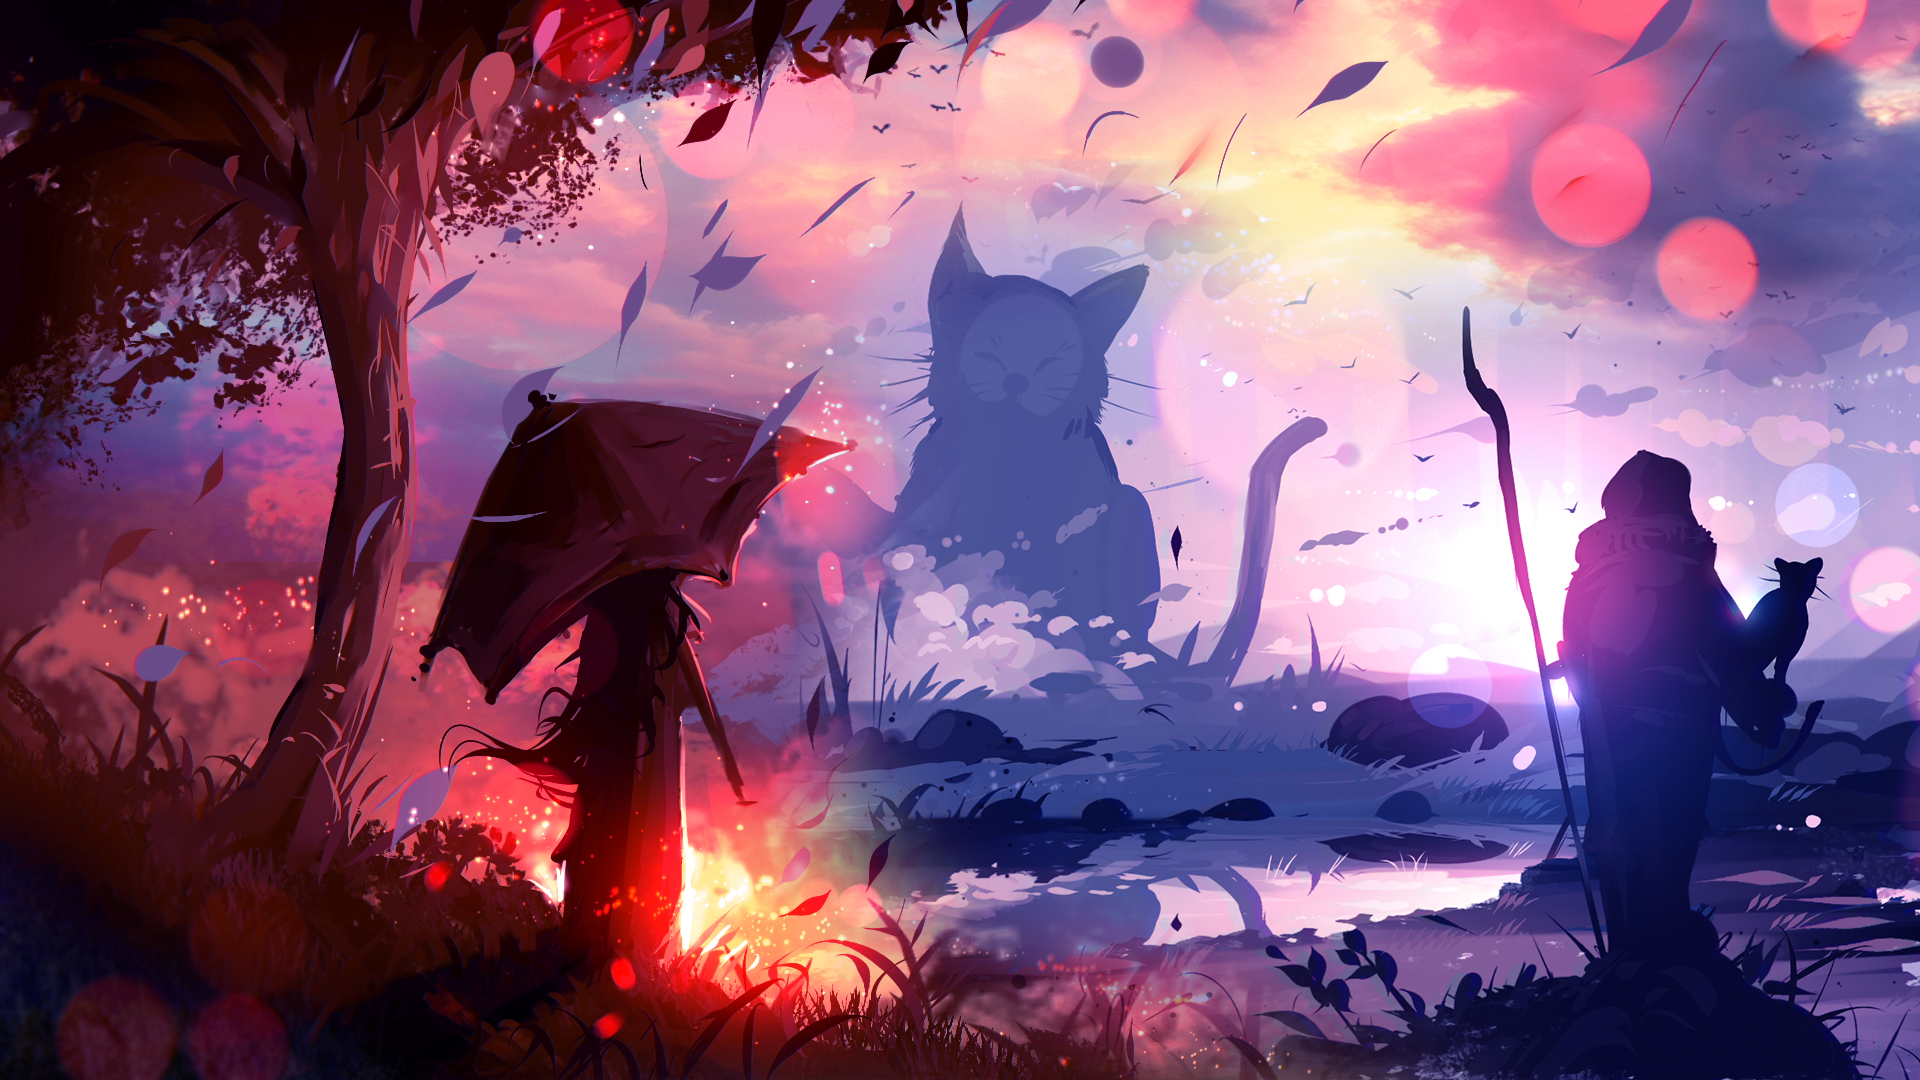 General 1920x1080 ryky painting digital art umbrella cats leaves bokeh